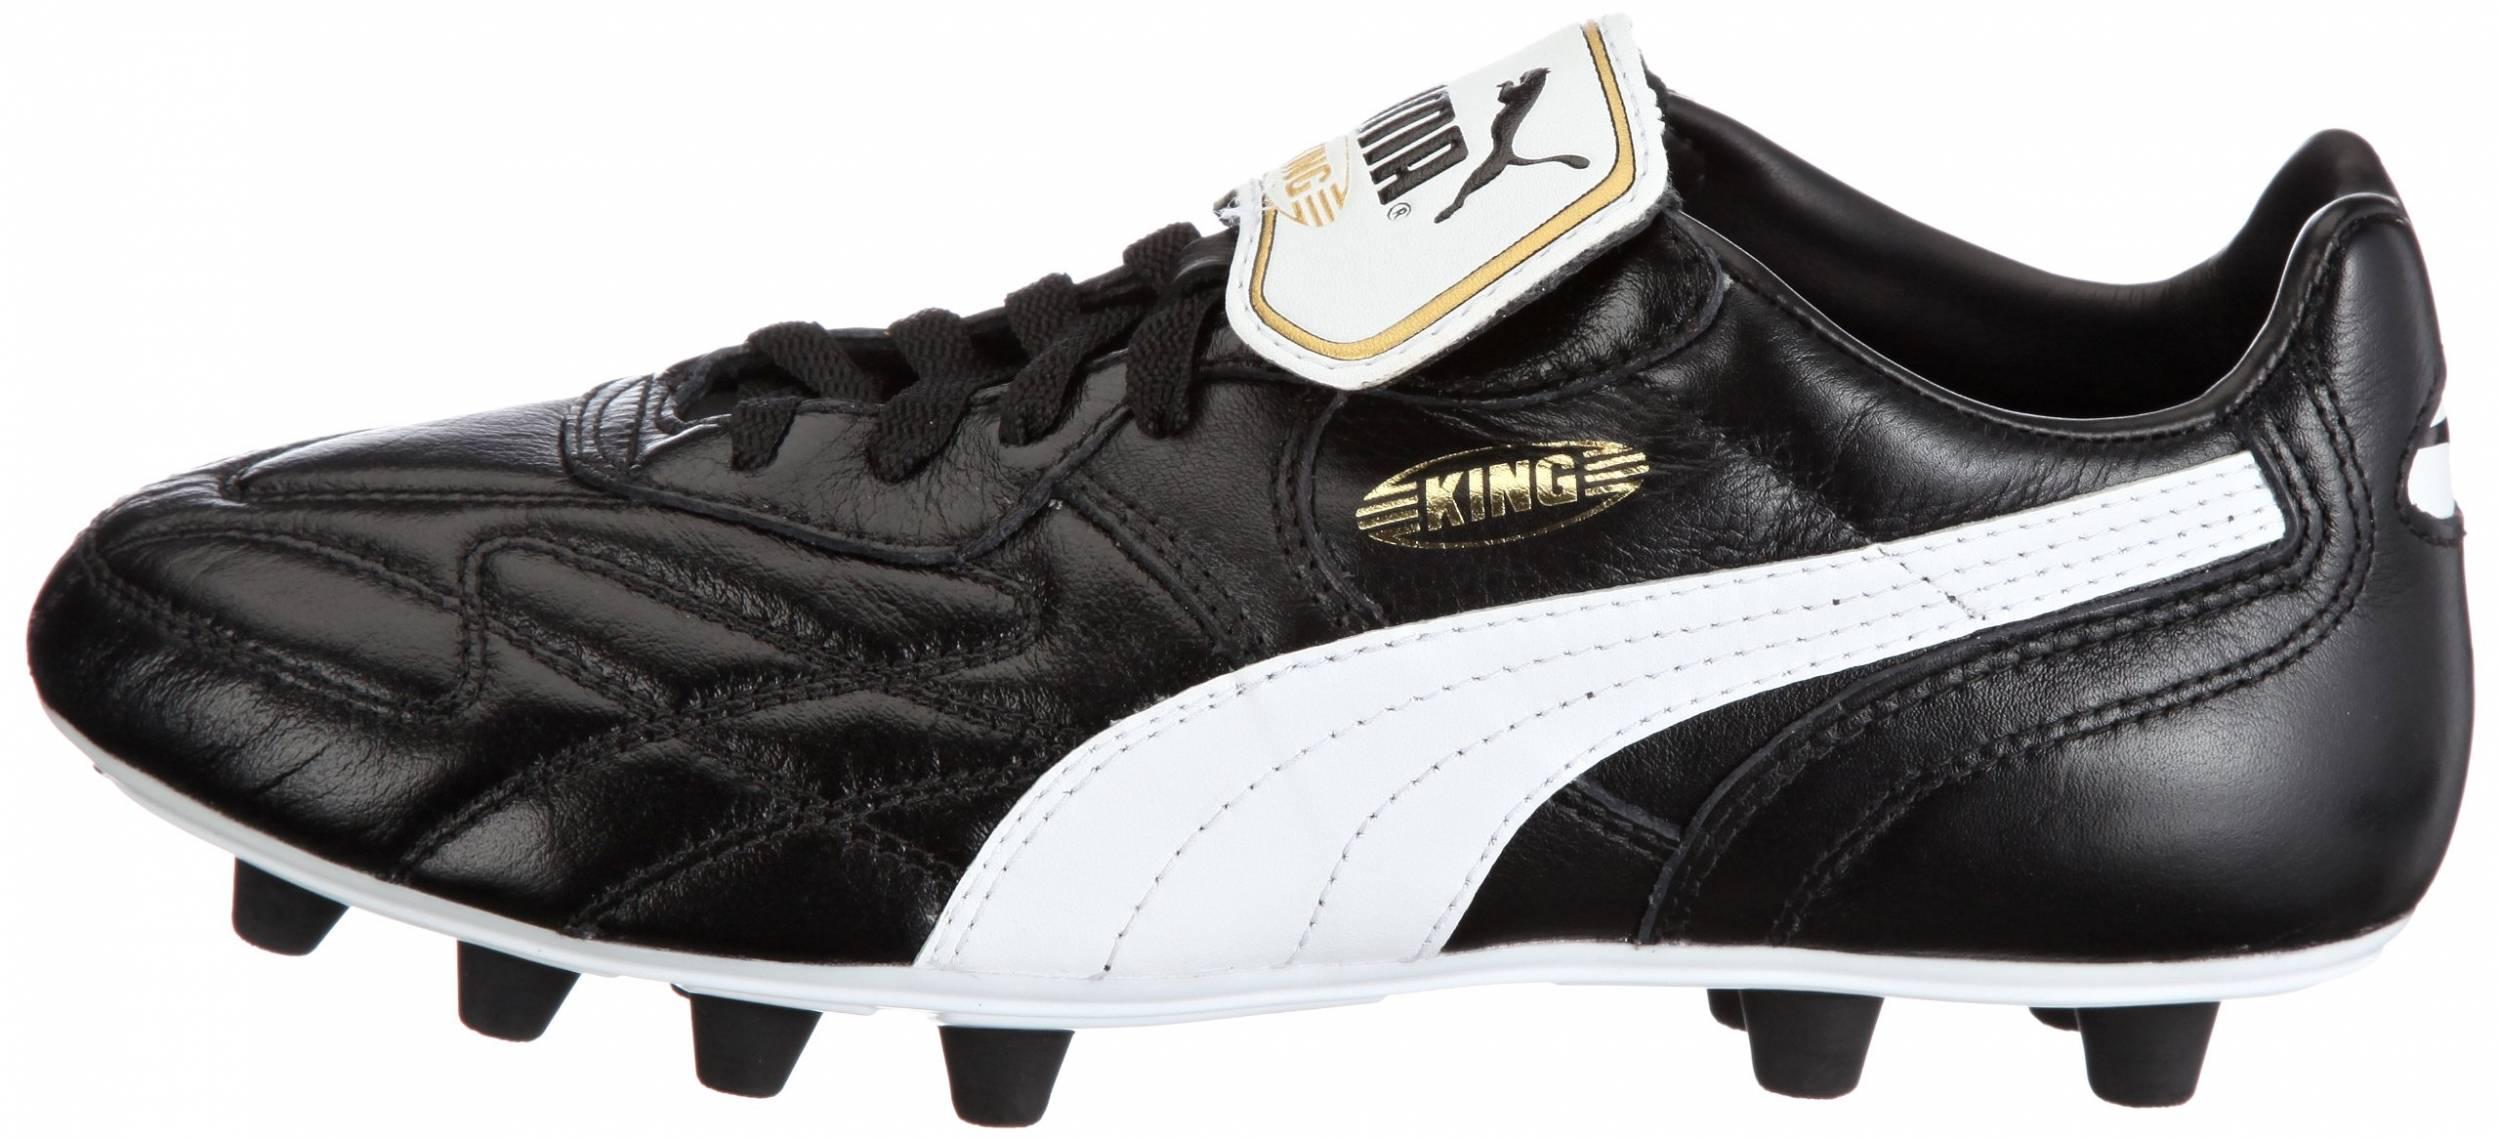 Save 49% on Puma Soccer Cleats (75